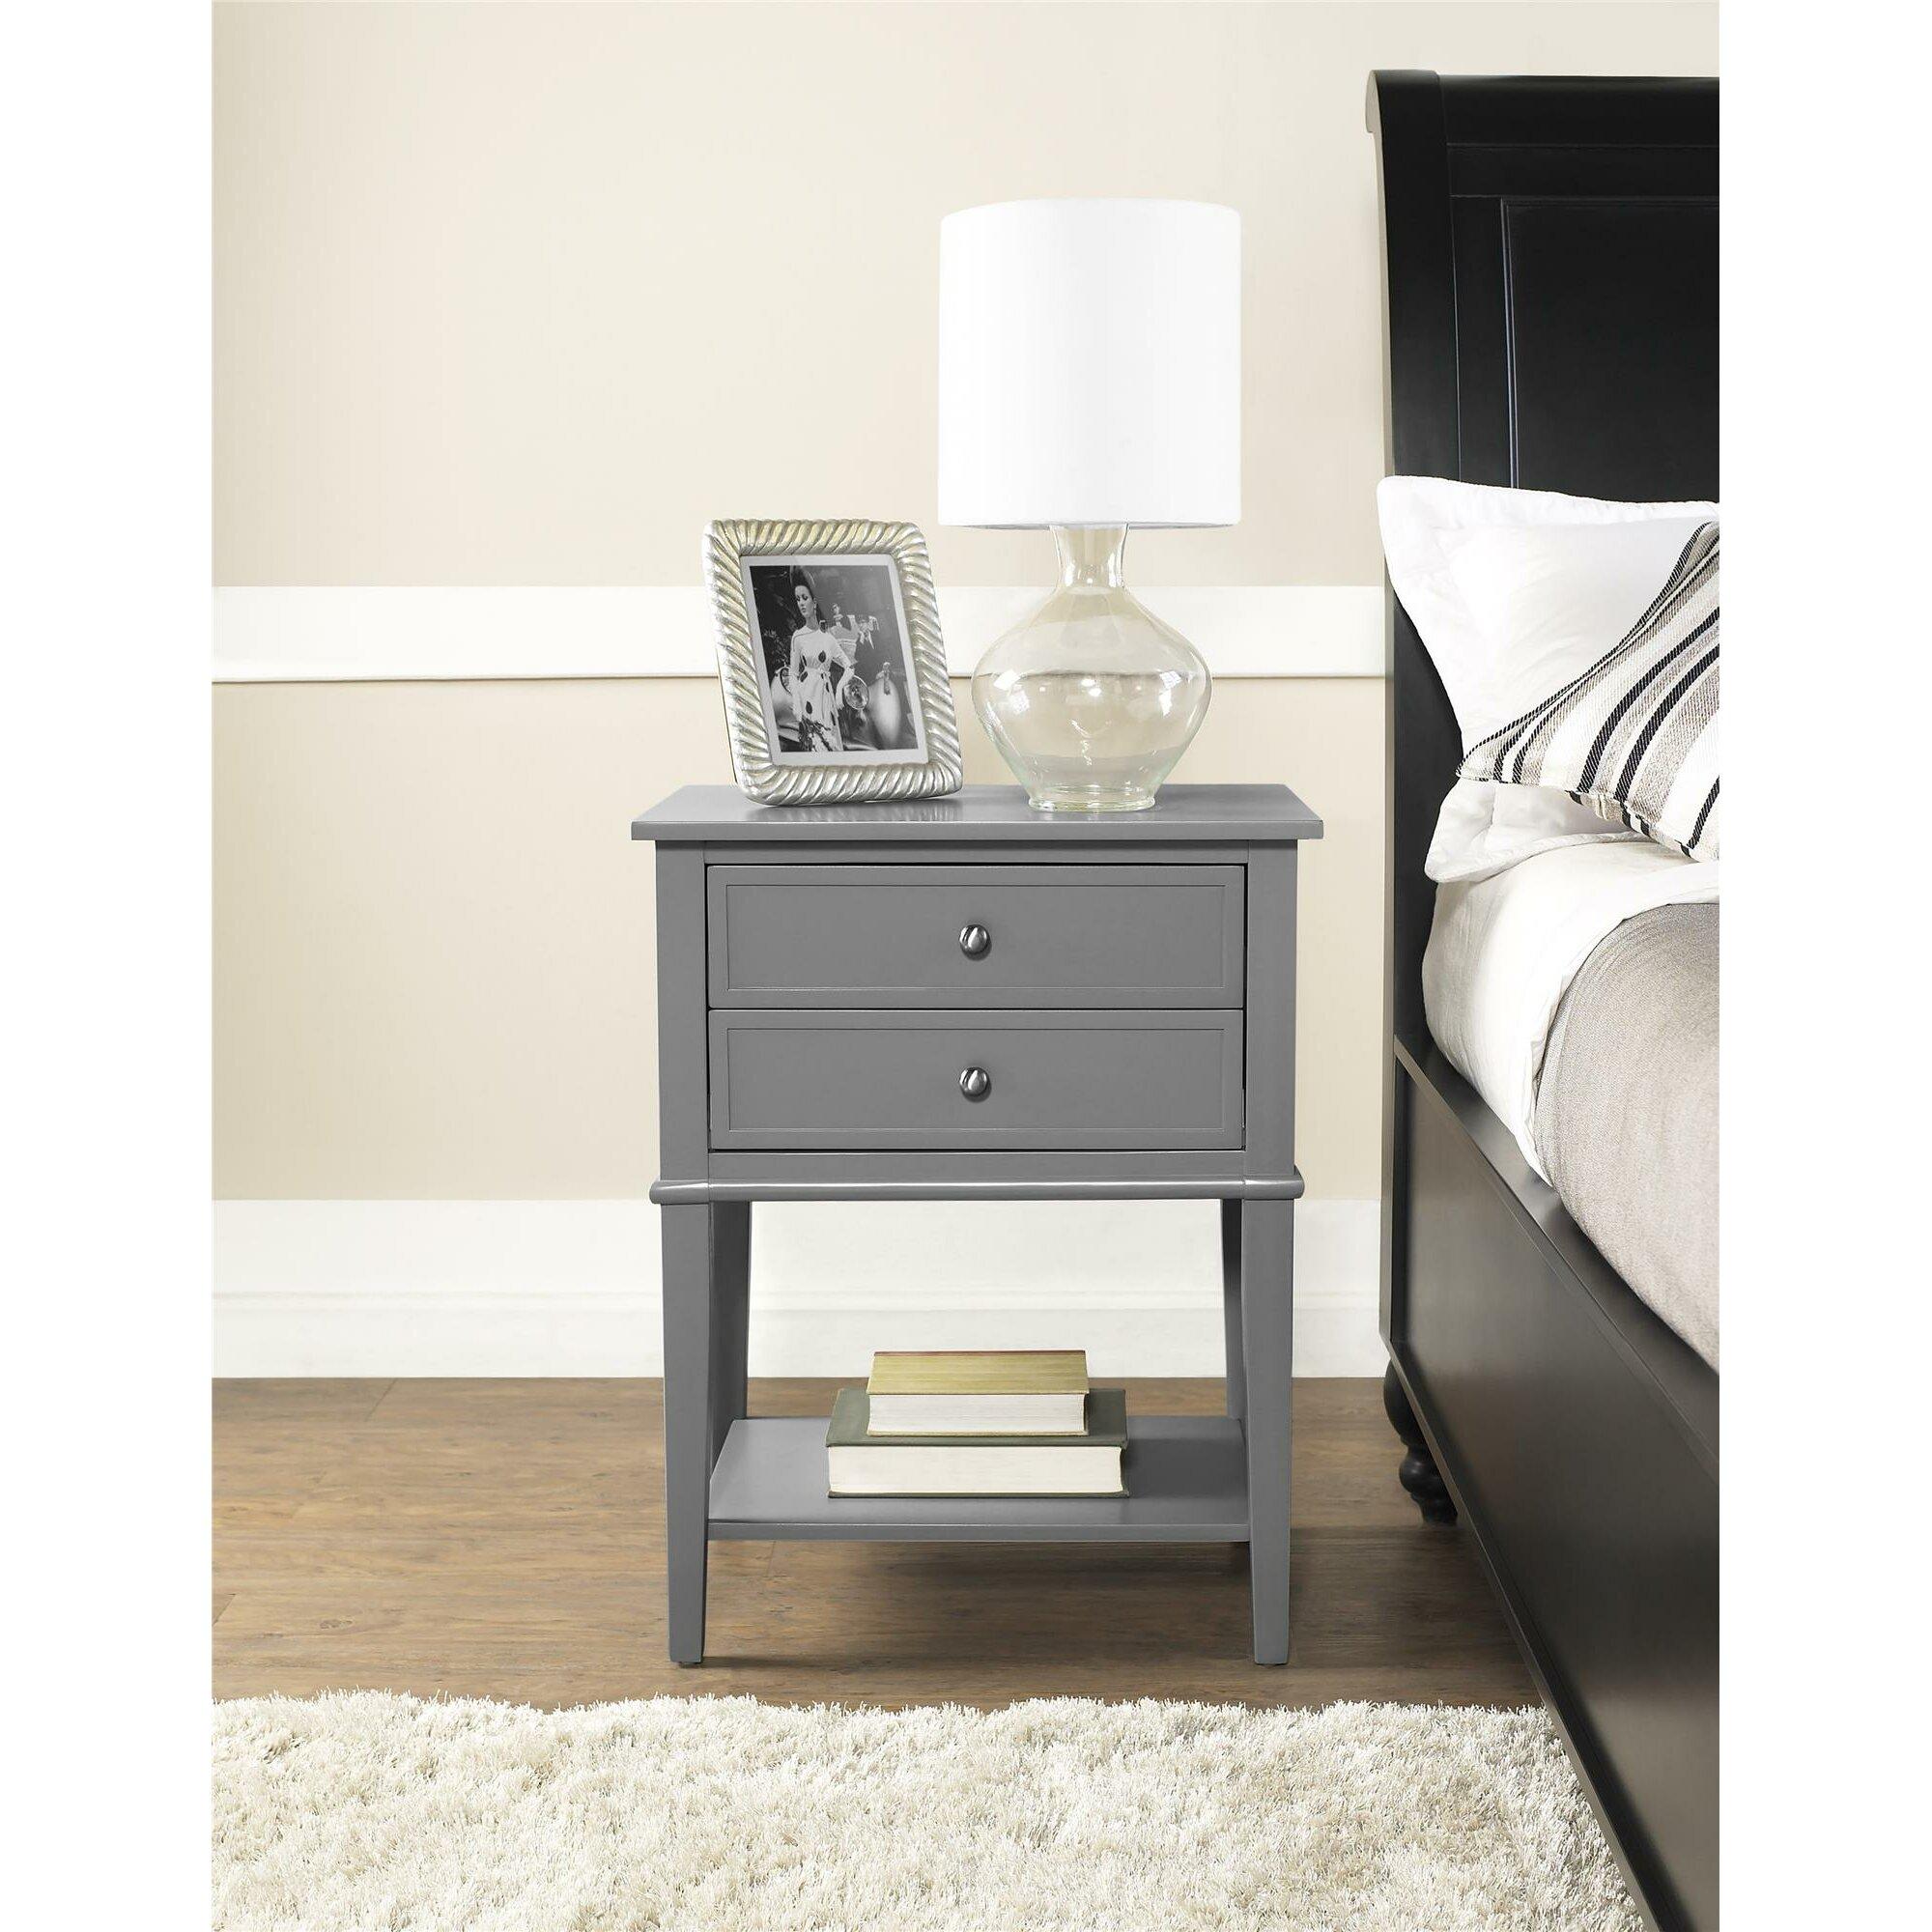 alcott hill grey 2 drawer end table reviews wayfair. Black Bedroom Furniture Sets. Home Design Ideas